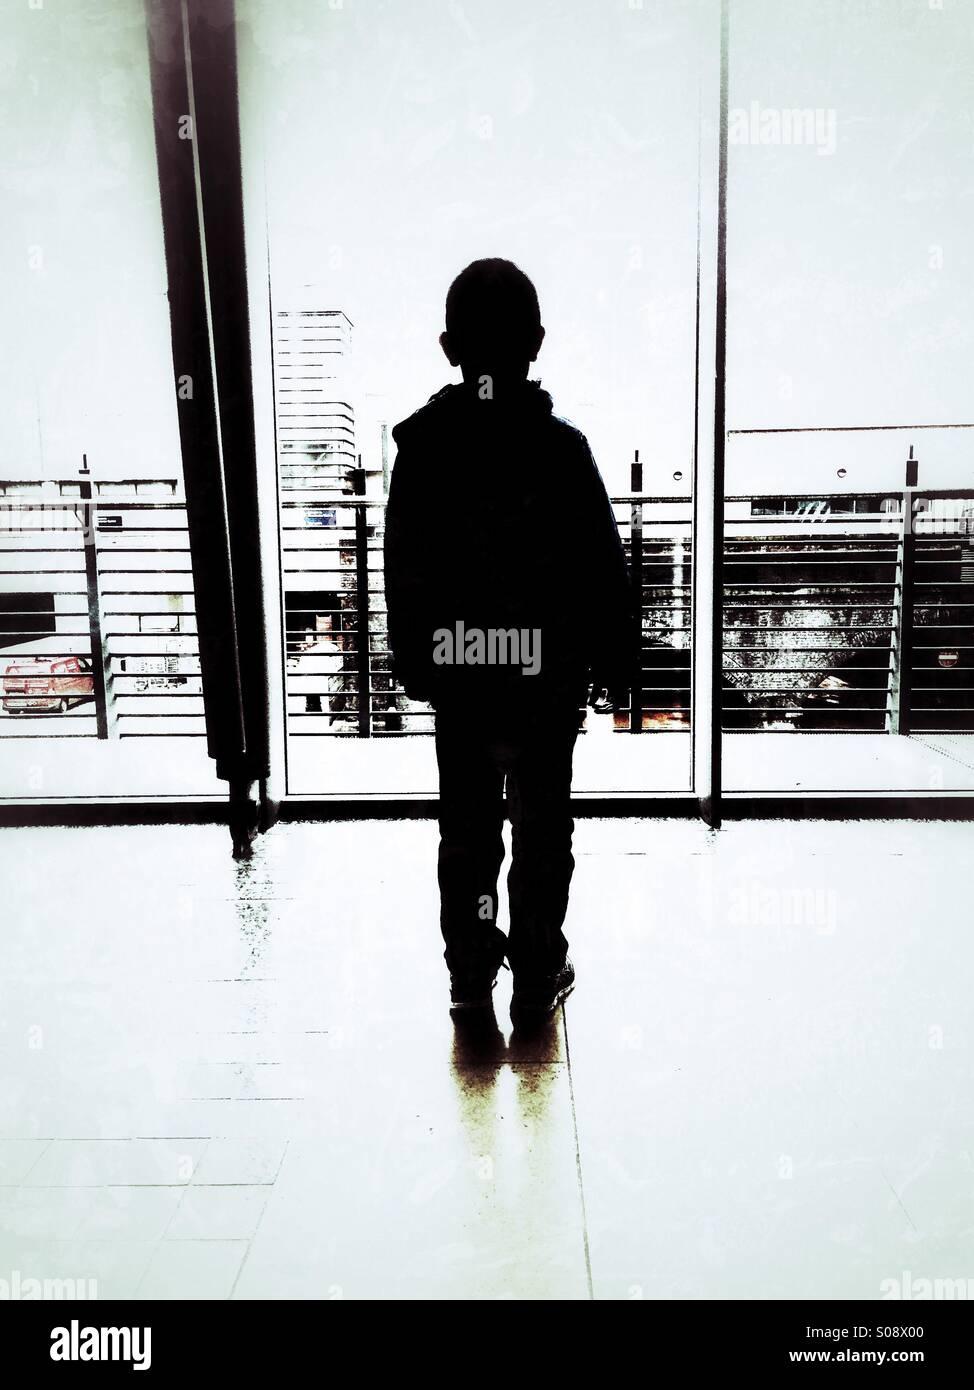 Niño de pie dentro de un edificio Imagen De Stock